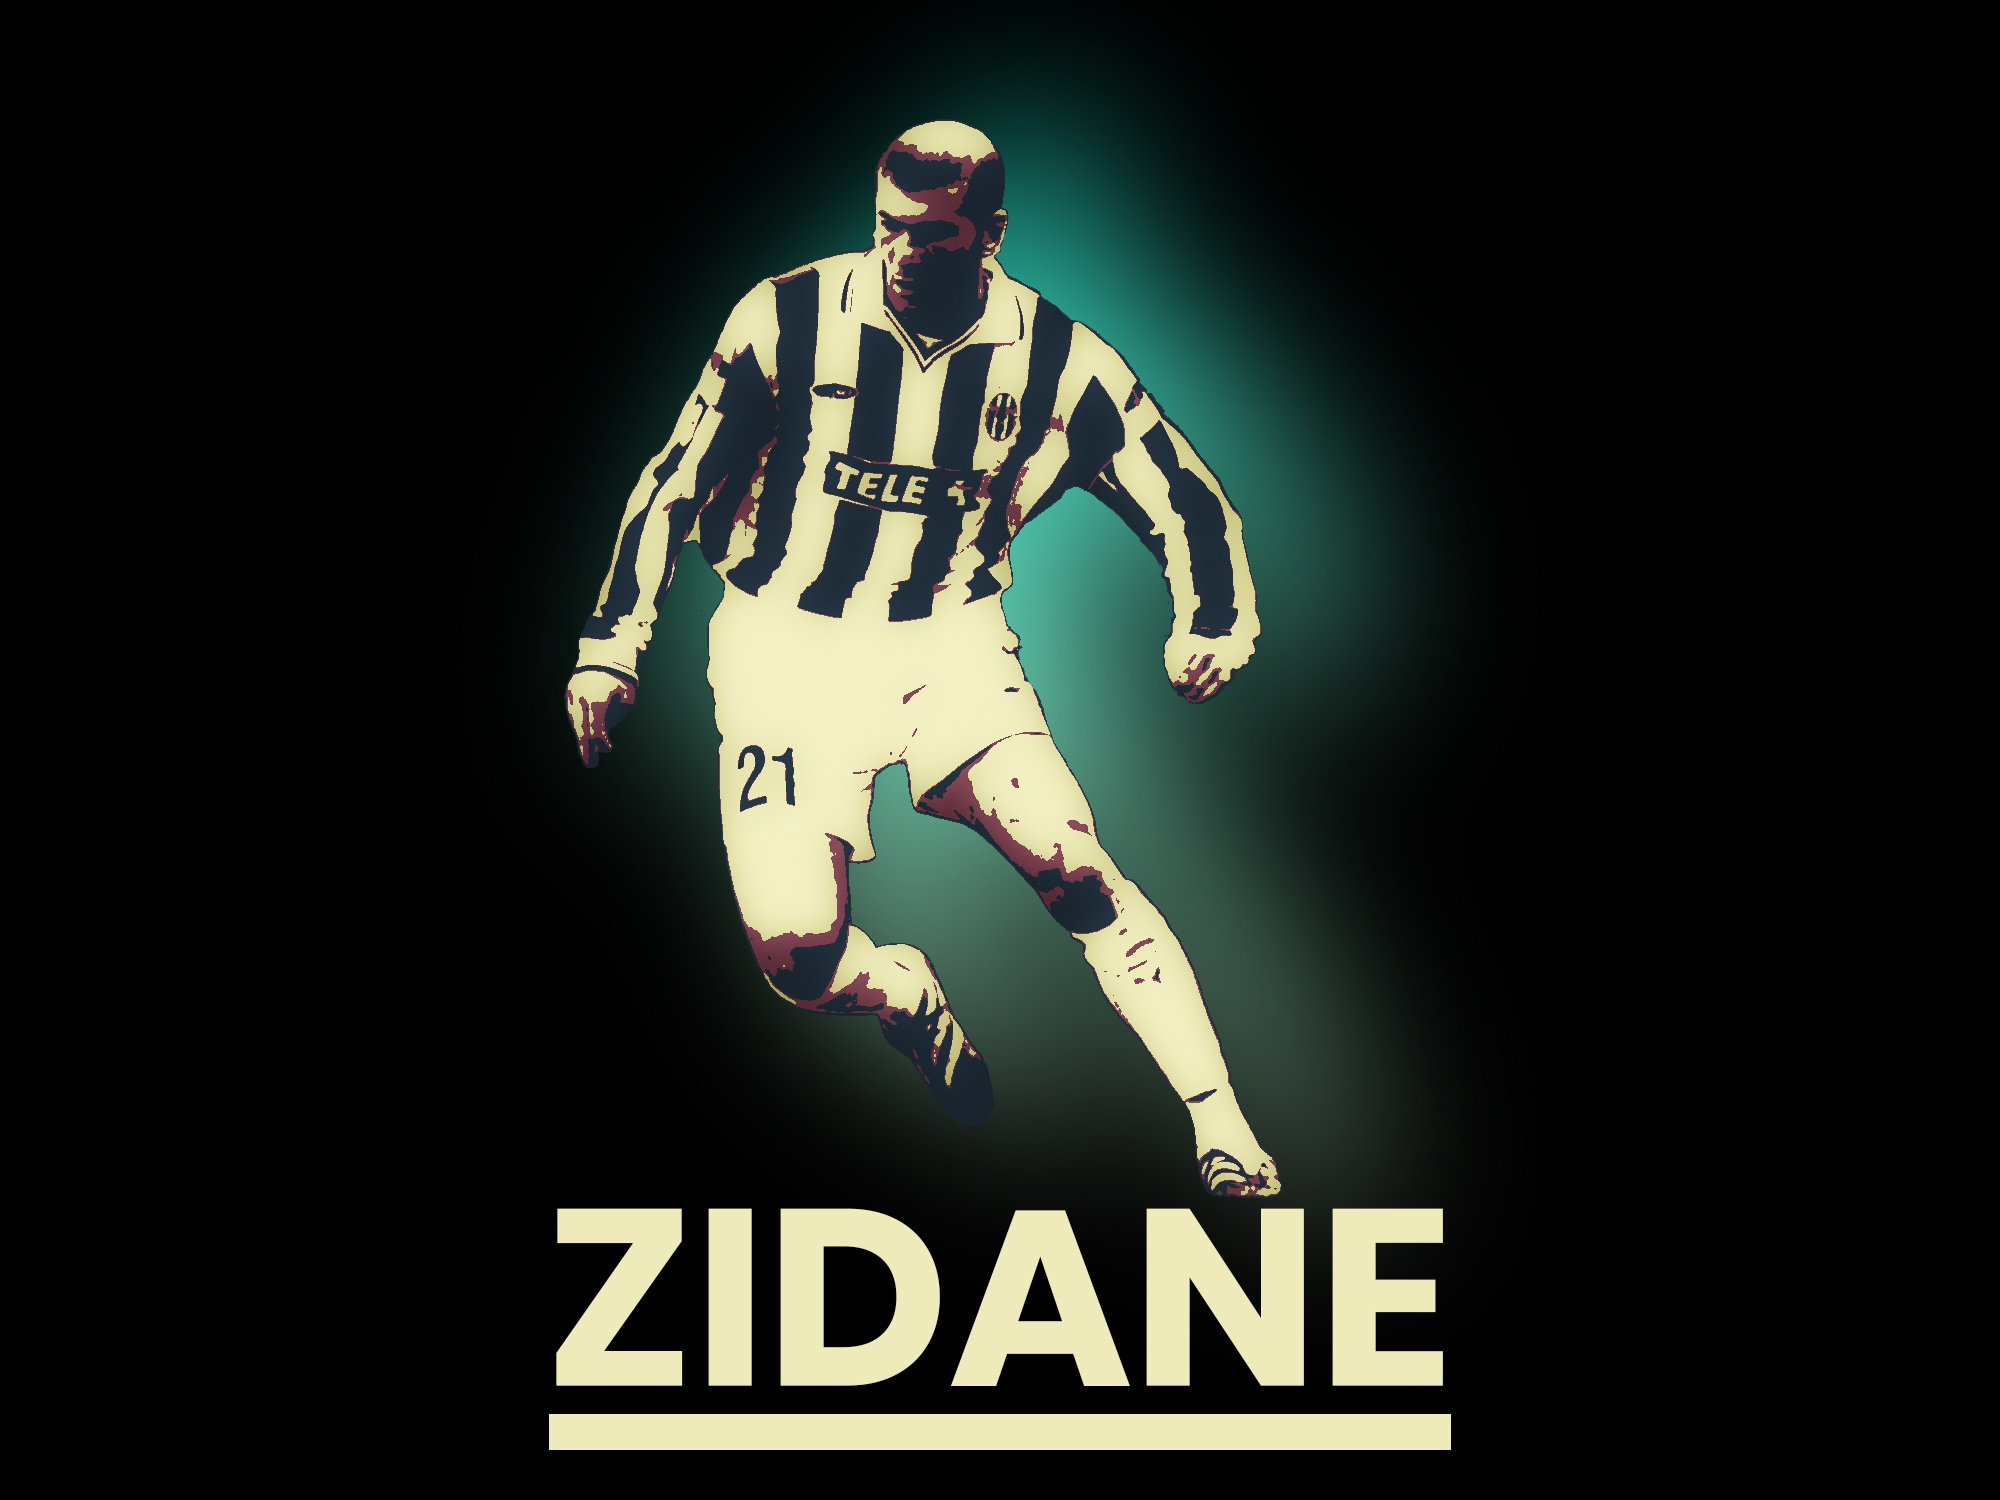 reputable site 88845 4dc64 Zinedine Zidane - Juventus by Nikola Sekić on Dribbble